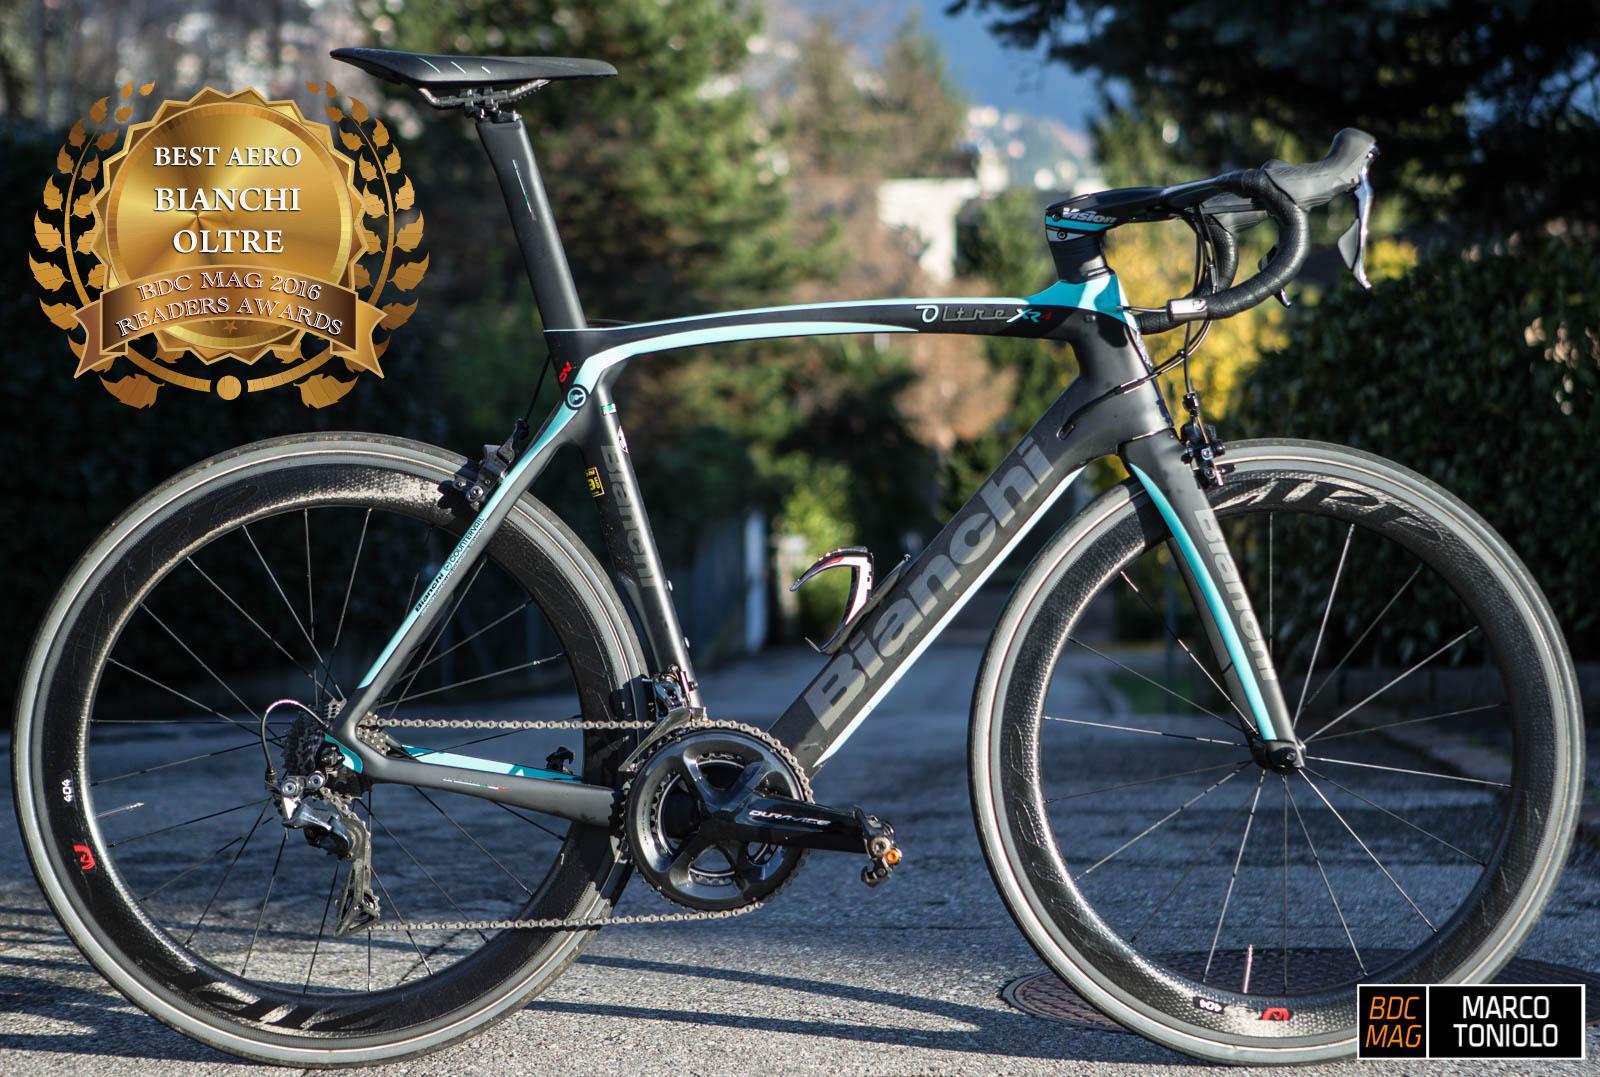 BDC-MAG Awards 2016: La Bianchi Oltre XR4 vince la categoria bici Aero